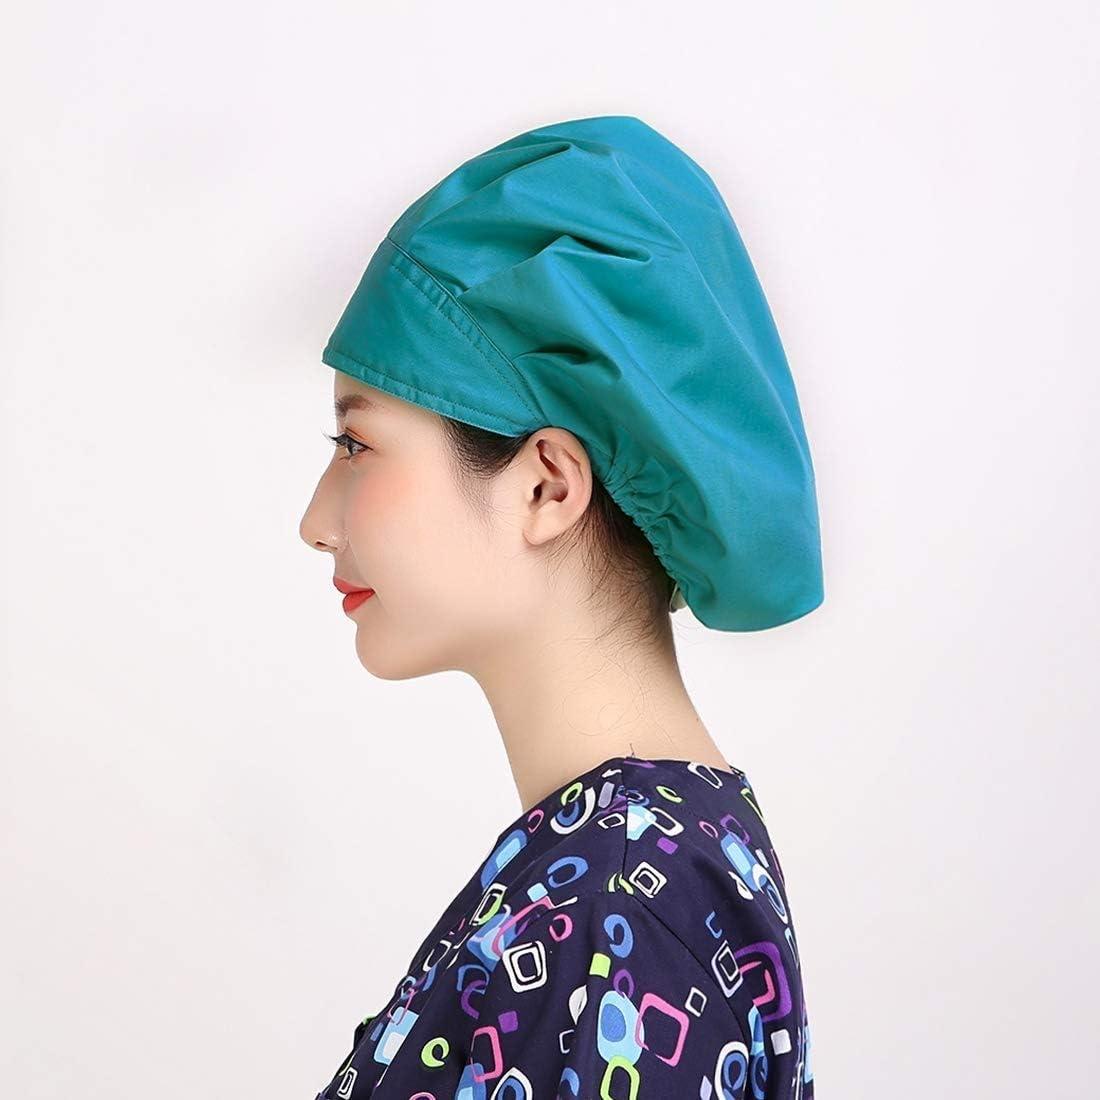 SurgicalCH 4pc Womens Adjustable Scrub Cap Sweatband Bouffant Hats Value Set